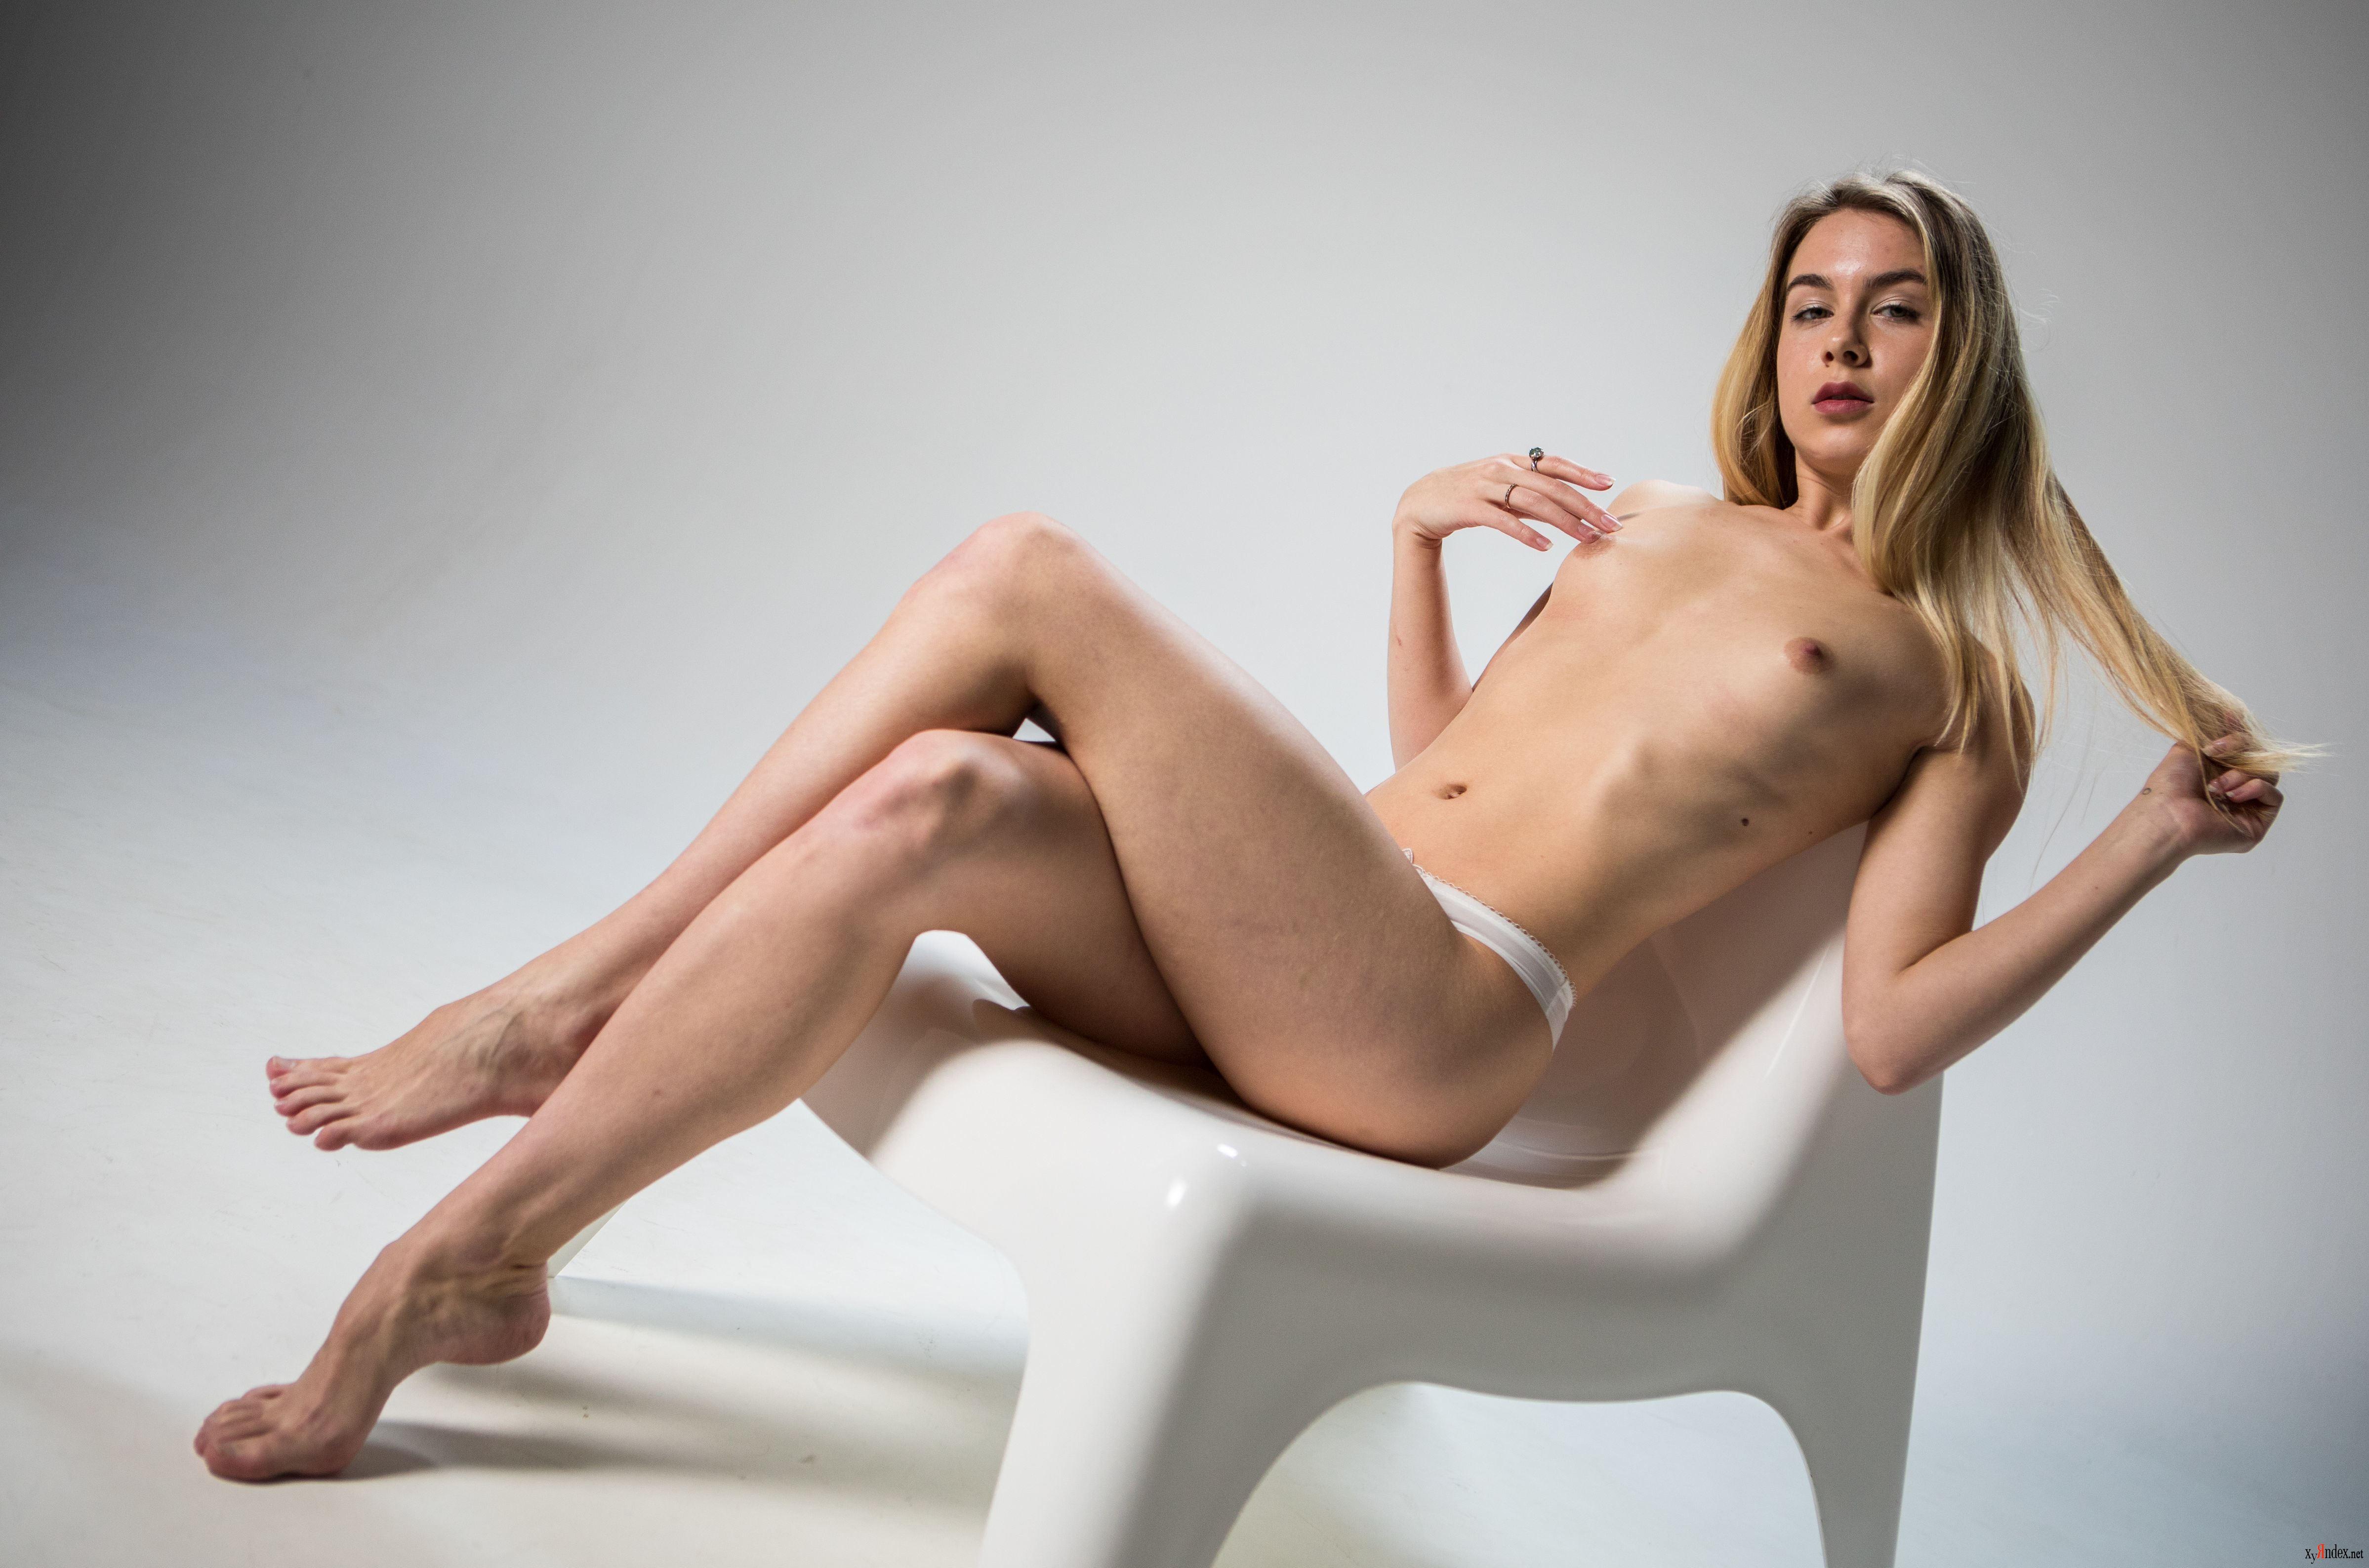 Hot College Sex Pics